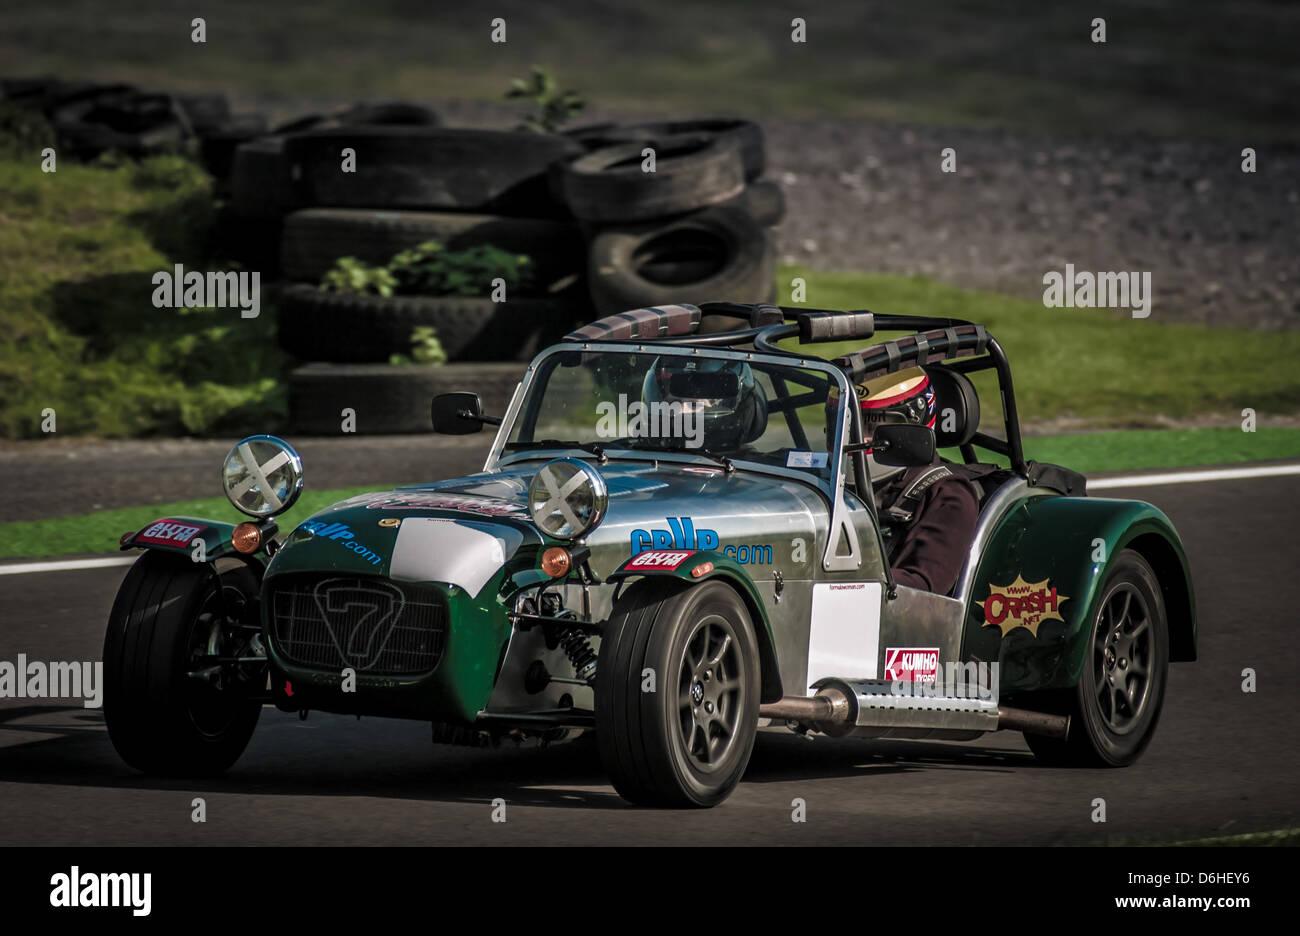 Caterham Motorsport bei Cadwell Park Rennstrecke Stockbild